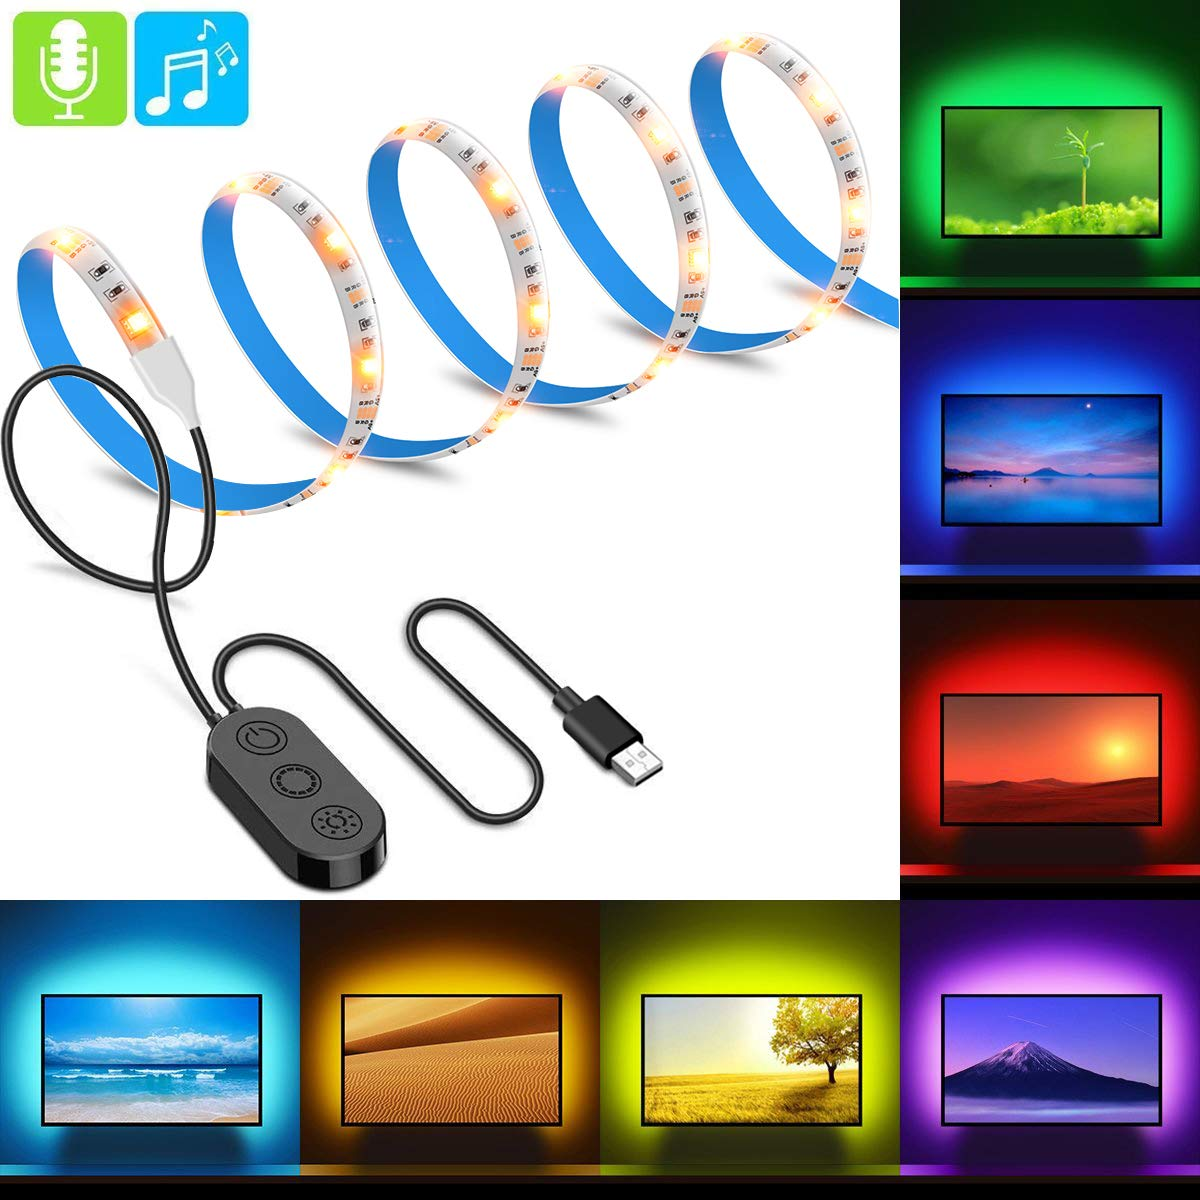 MINGER TV LED Strip Lights 6.56ft 5050 LED TV Backlight Strip USB Music TV Backlighting Built in MIC Changing Color Strip Kit Bias Monitor Lighting Waterproof Bias Lighting for HDTV Desktop PC